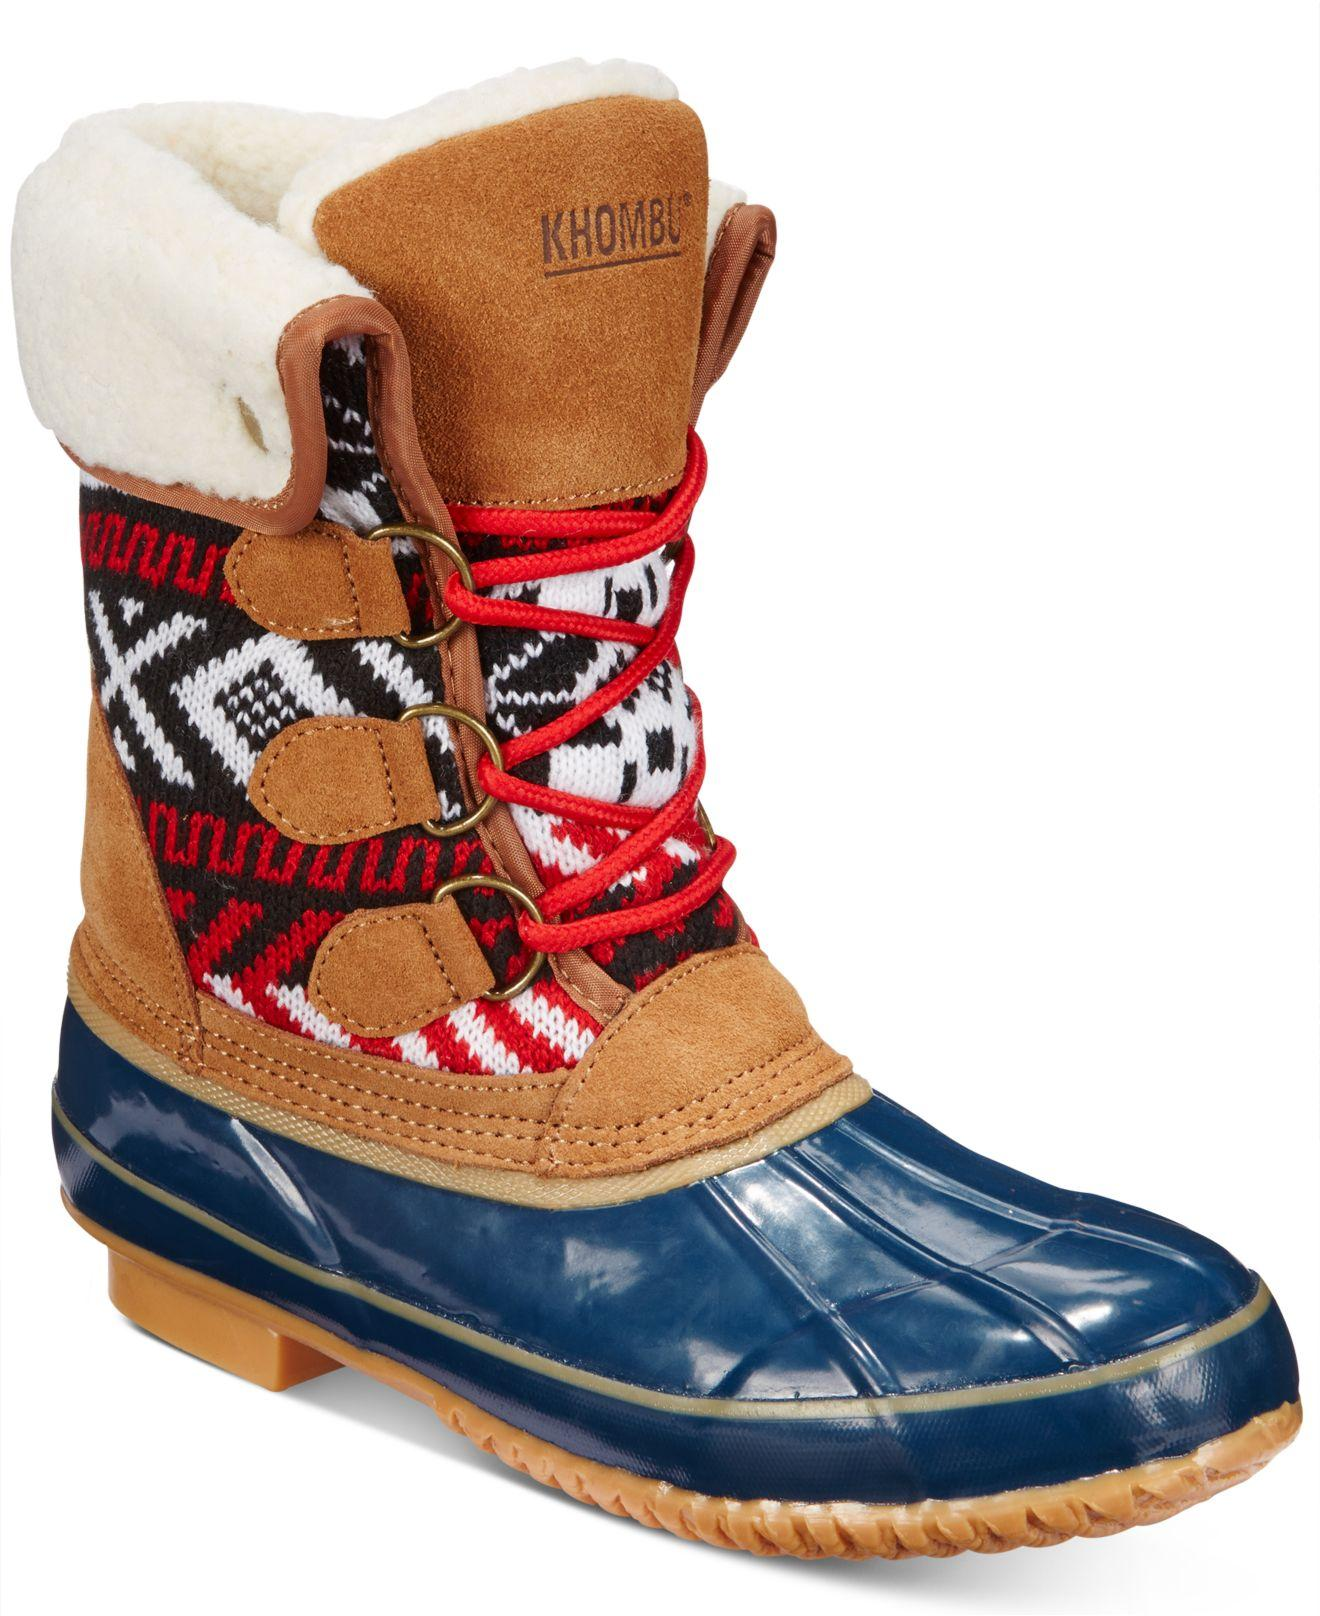 Yoox Co Uk Shoes